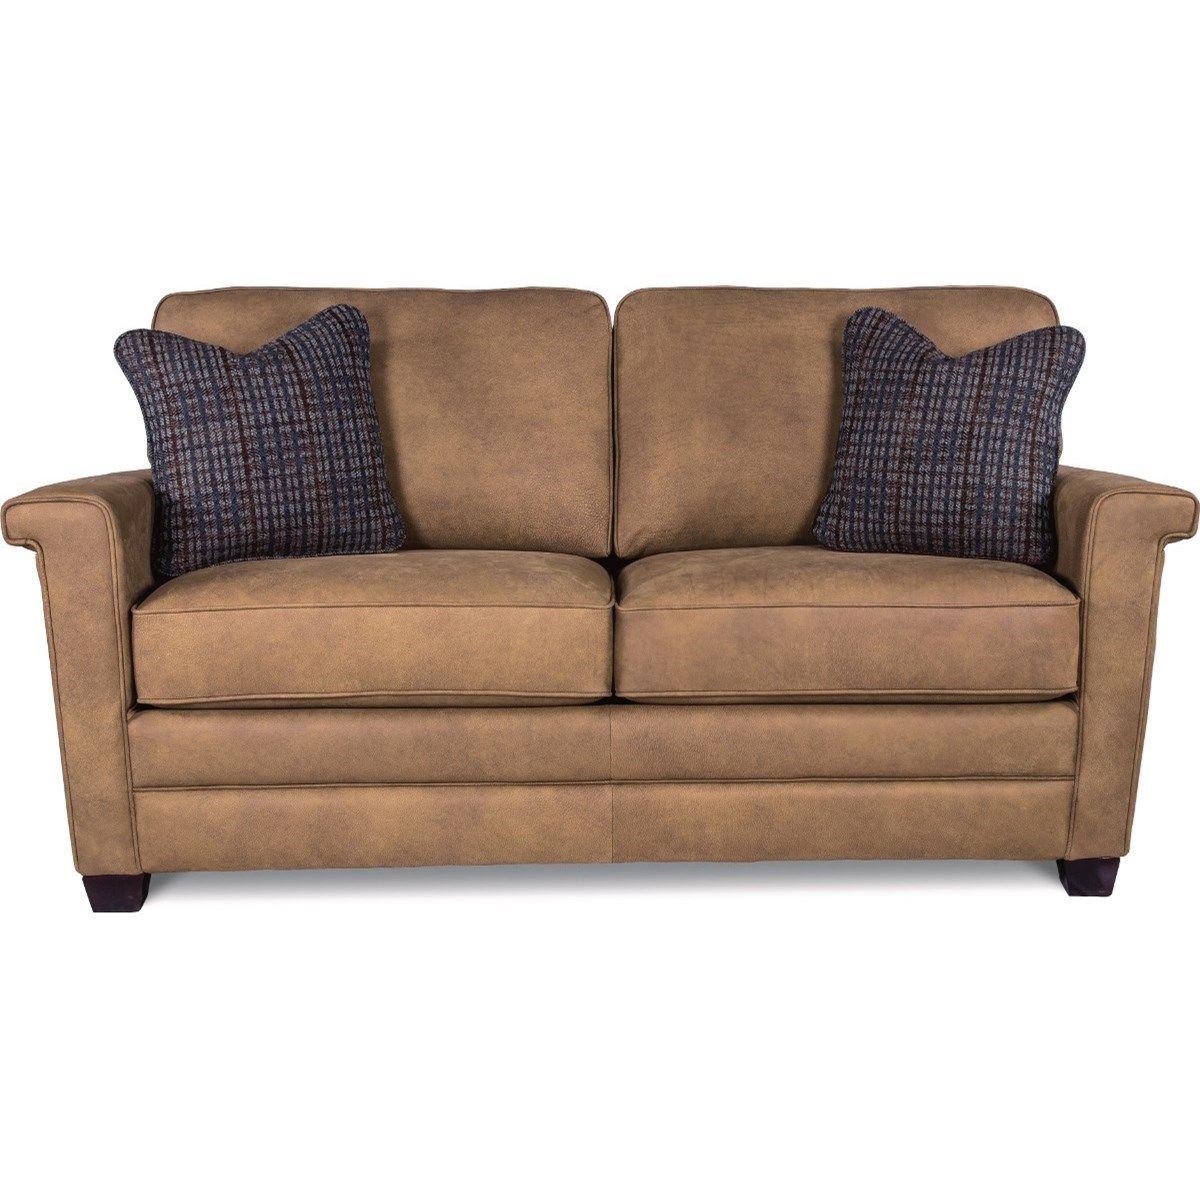 la z boy bexley contemporary apartment size sofa godby. Black Bedroom Furniture Sets. Home Design Ideas